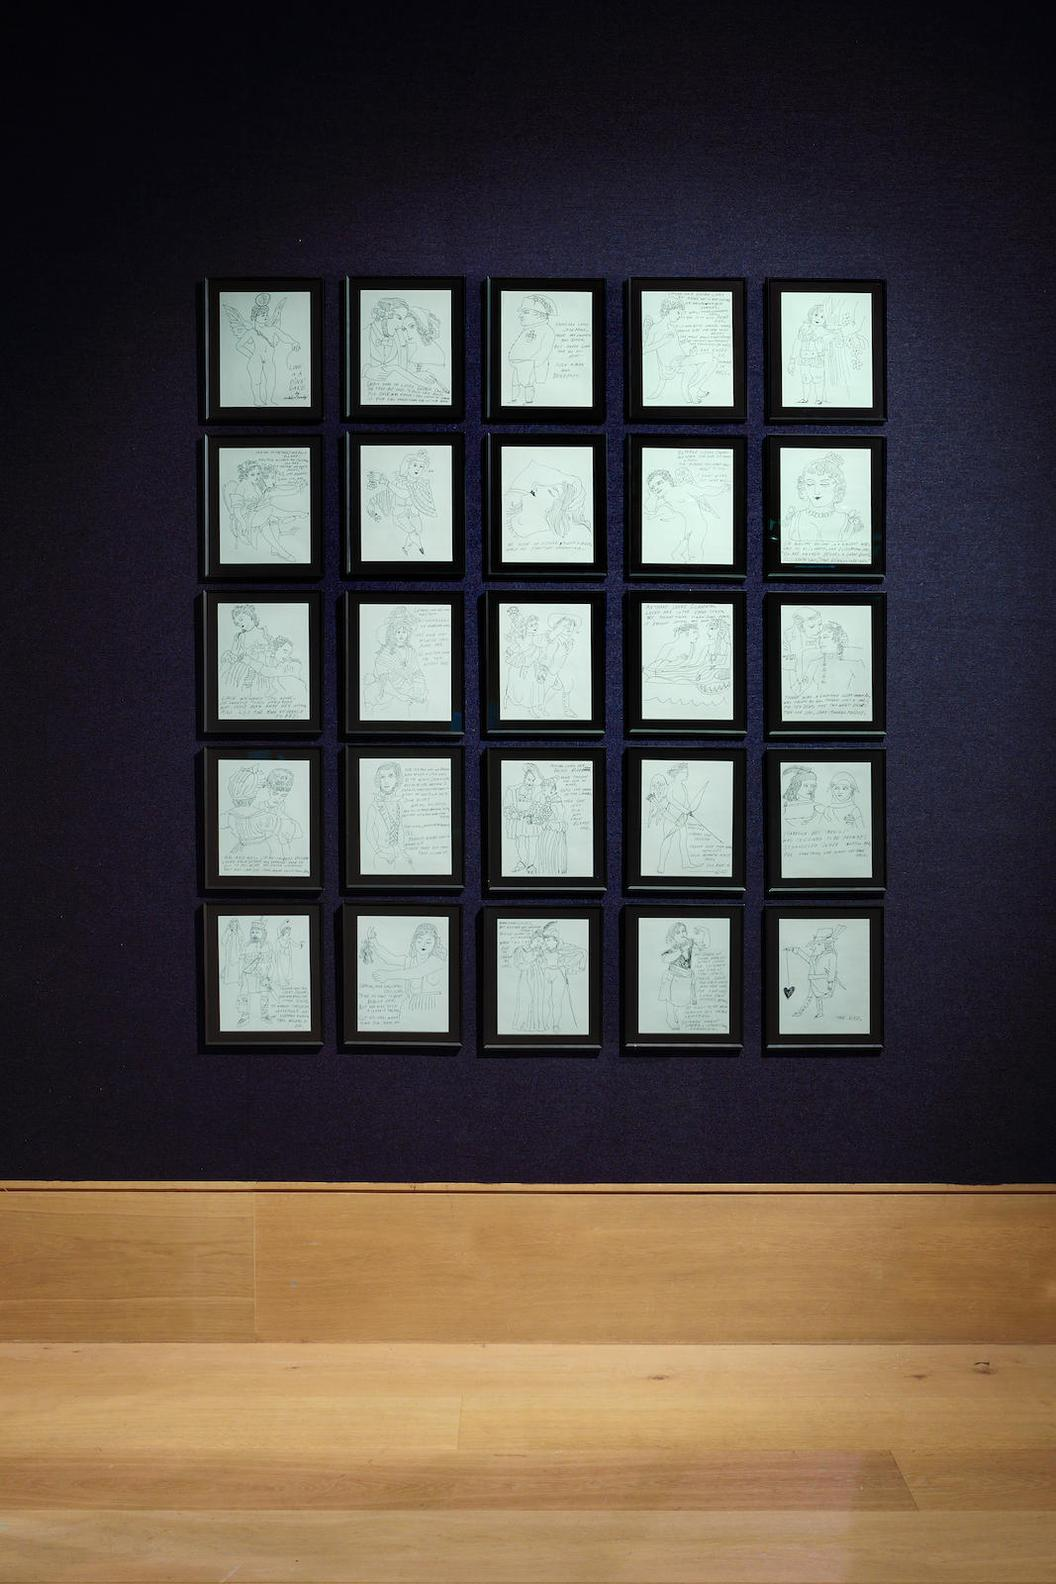 Andy Warhol-Love Is A Pink Cake (Feldman & Schellmann IV.27-50)-1953